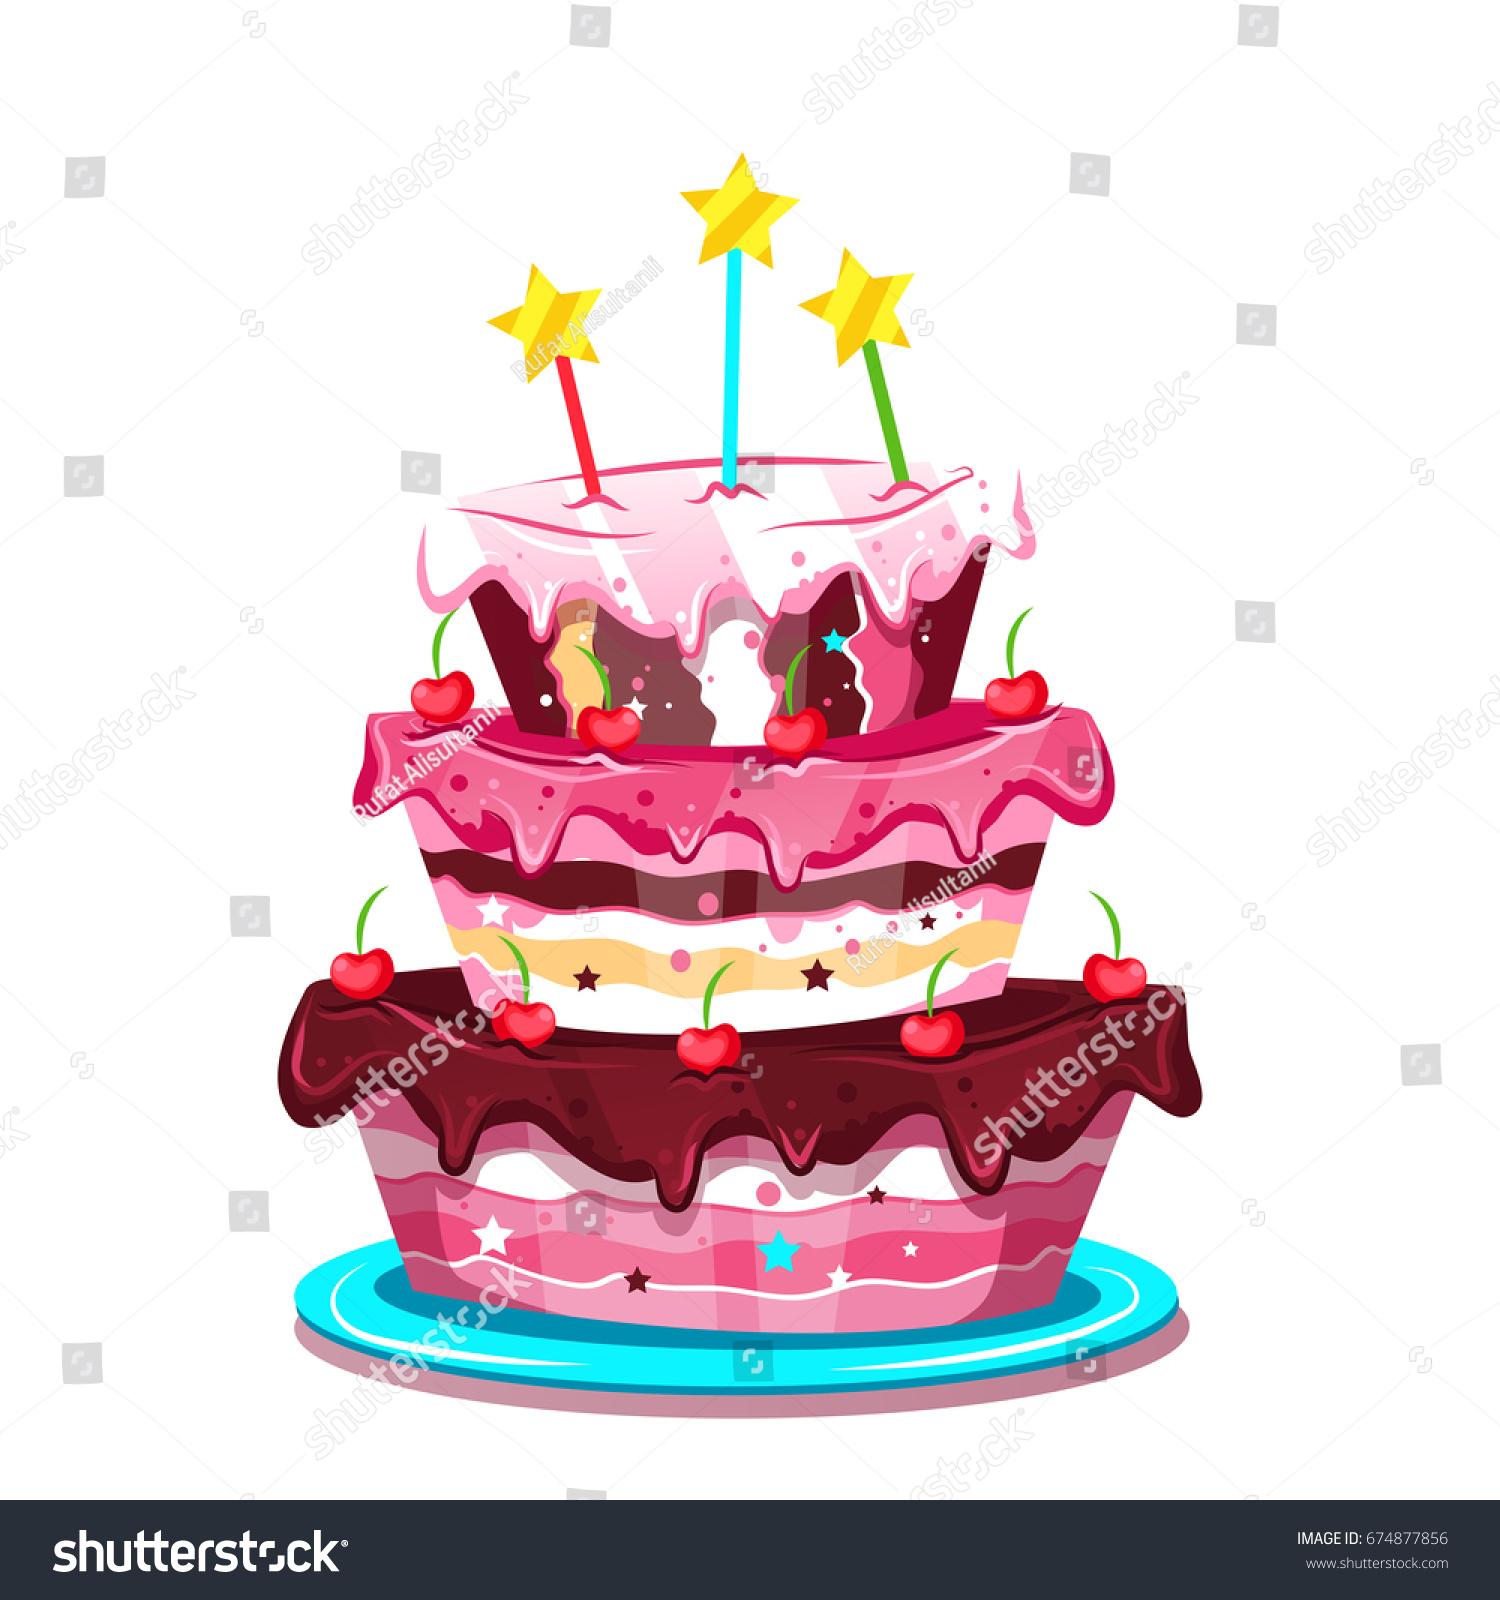 Big Cute Birthday Cake Vector Illustration Stock Vector Royalty